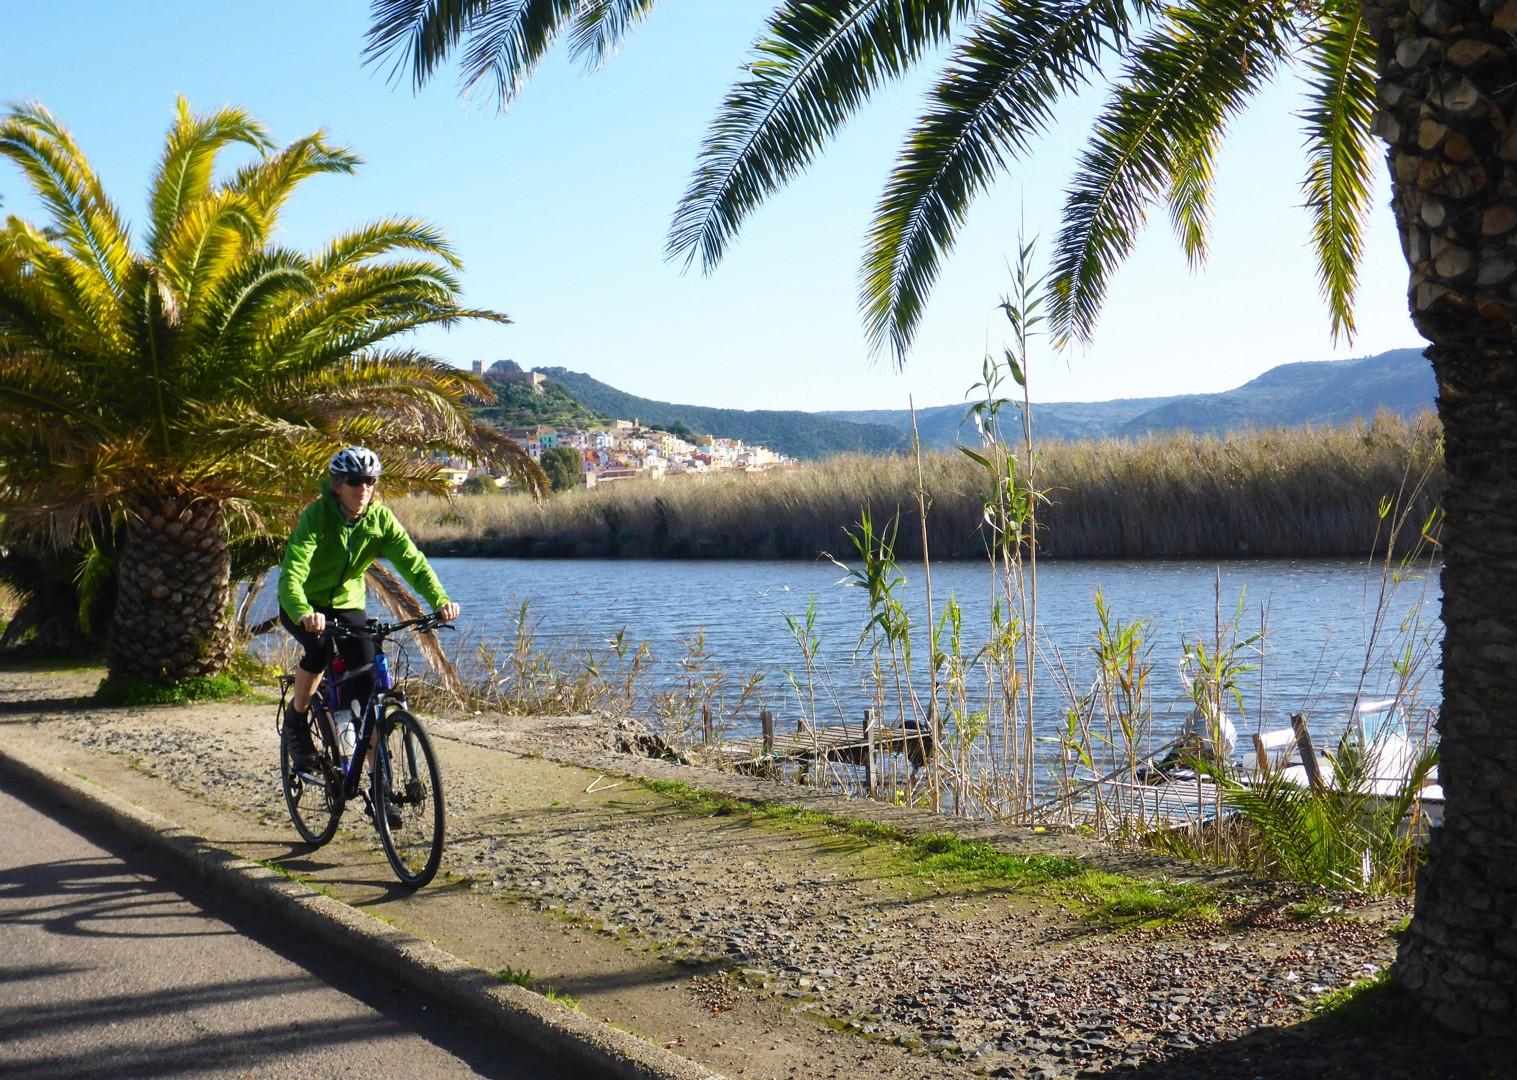 sardinia-leisure-cycling-holiday-saddle-skedaddle.jpg - Italy - Sardinia - West Coast Wonders - Self-Guided Leisure Cycling Holiday - Leisure Cycling